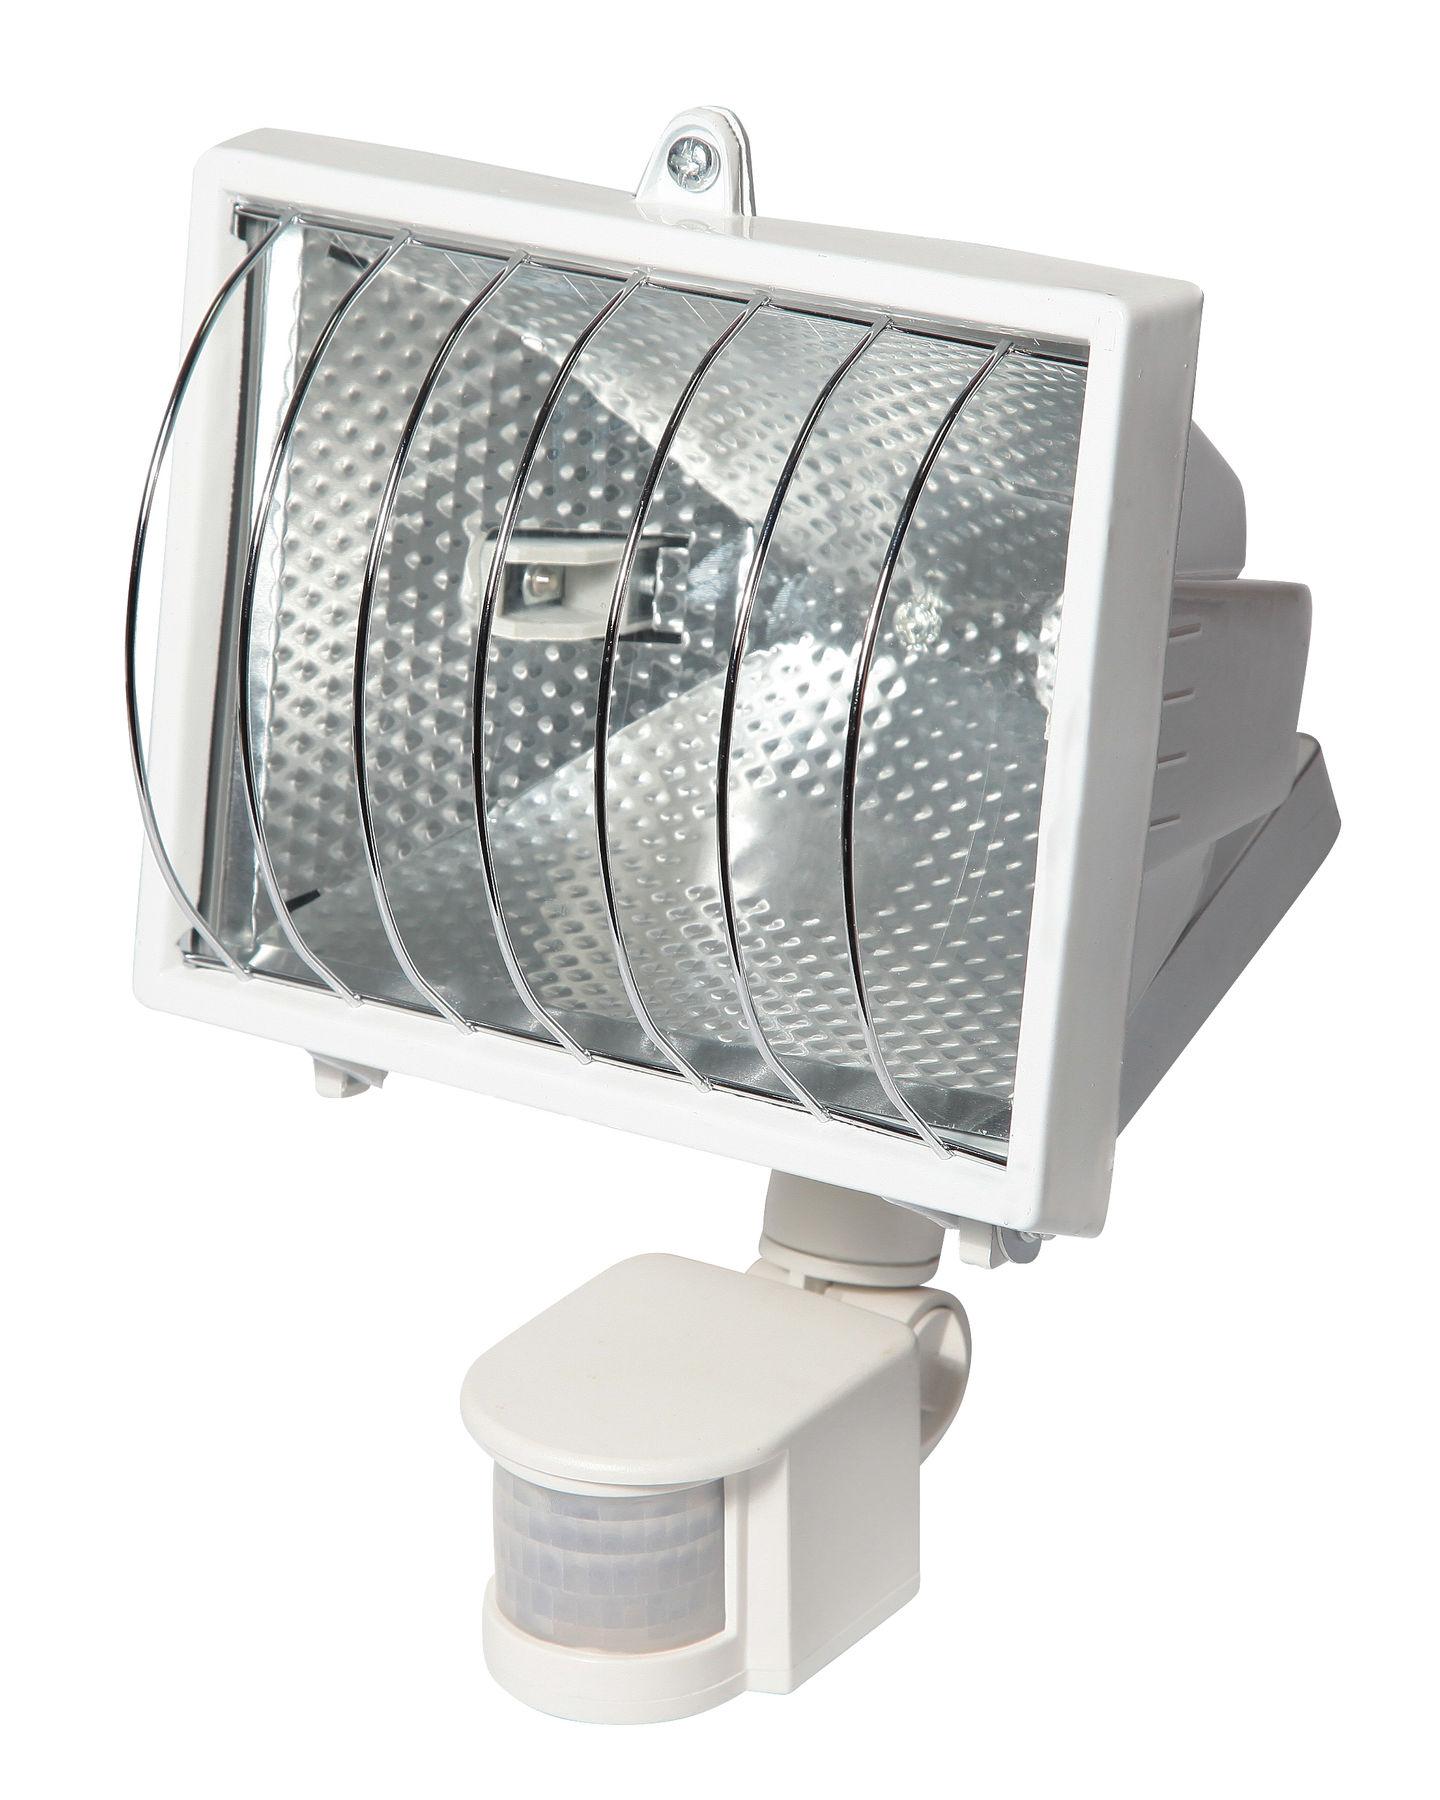 HiDubai-business-cdm-lighting-design-b2b-services-distributors-wholesalers-al-barsha-south-3-dubai-2